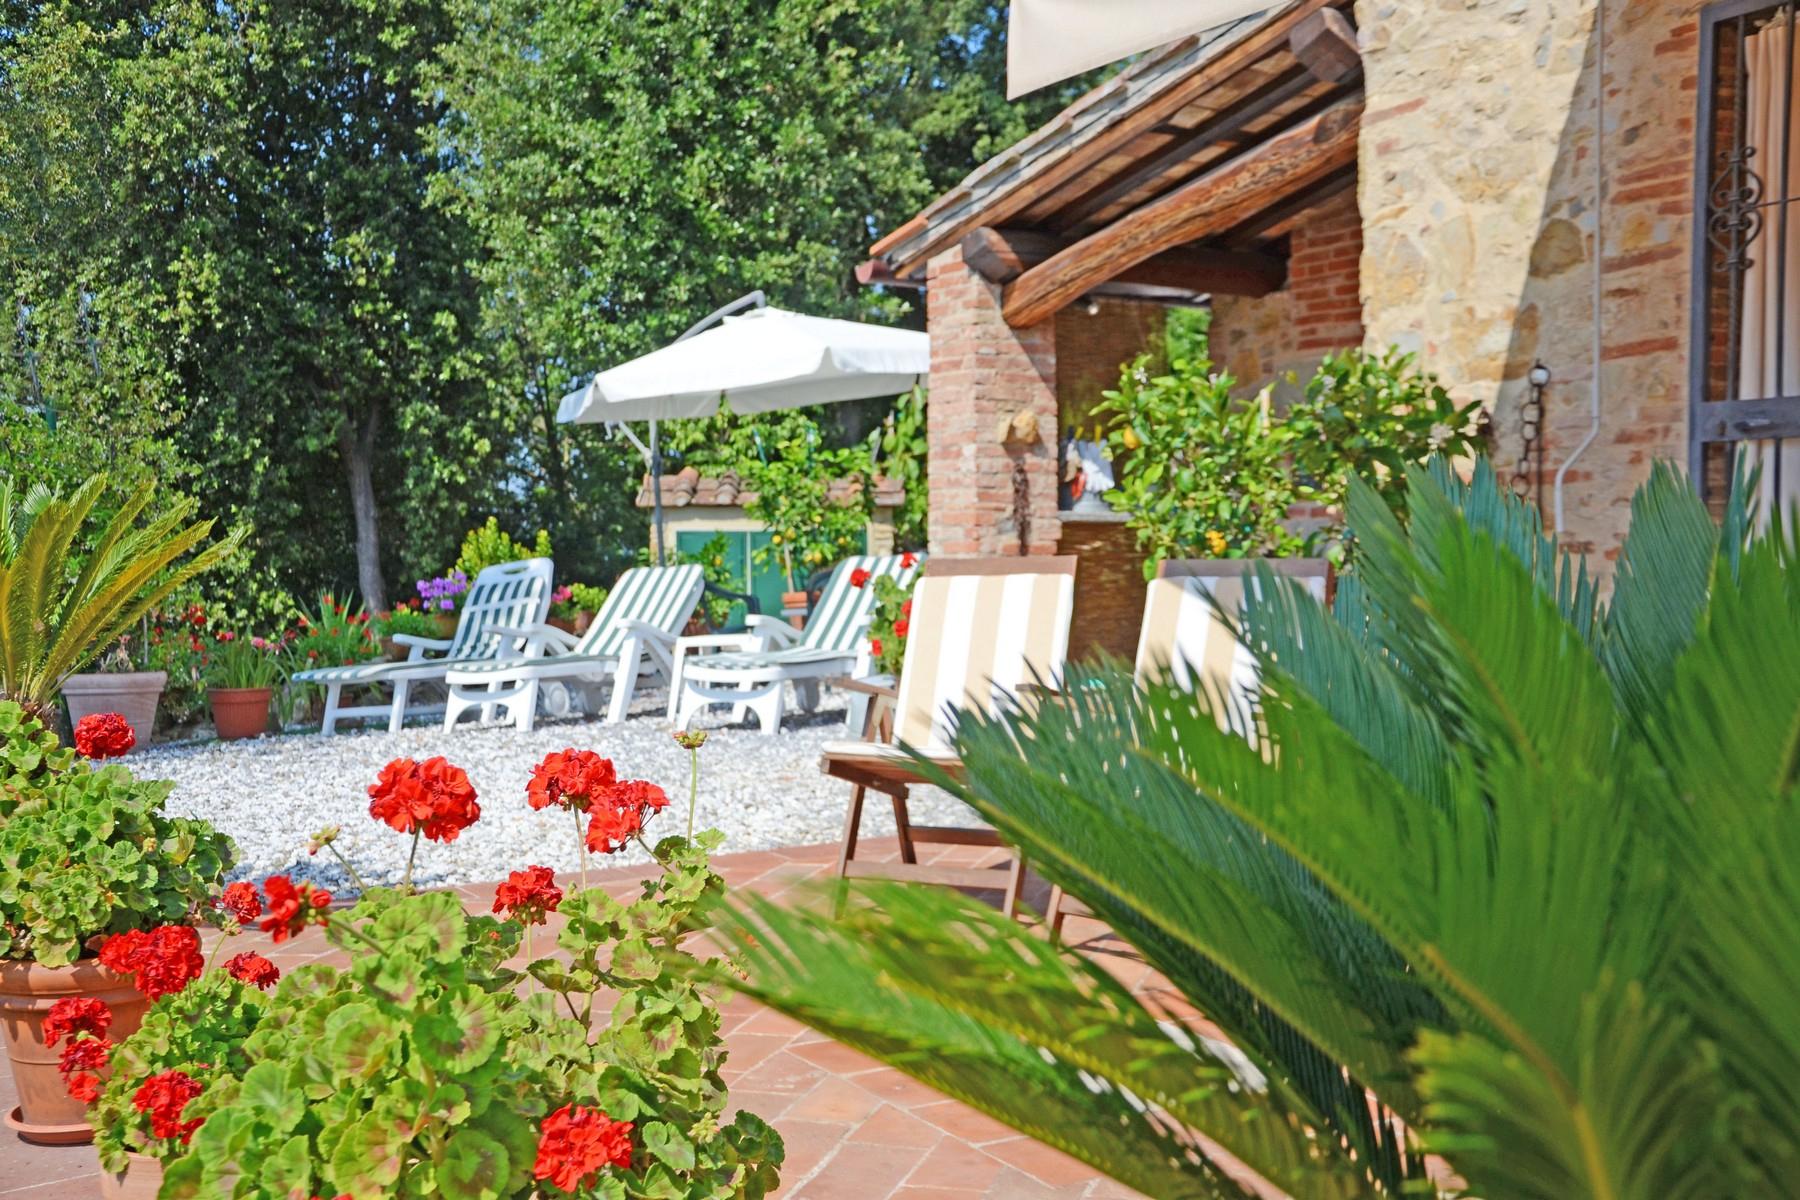 Rustico in Vendita a Lucca: 5 locali, 210 mq - Foto 26